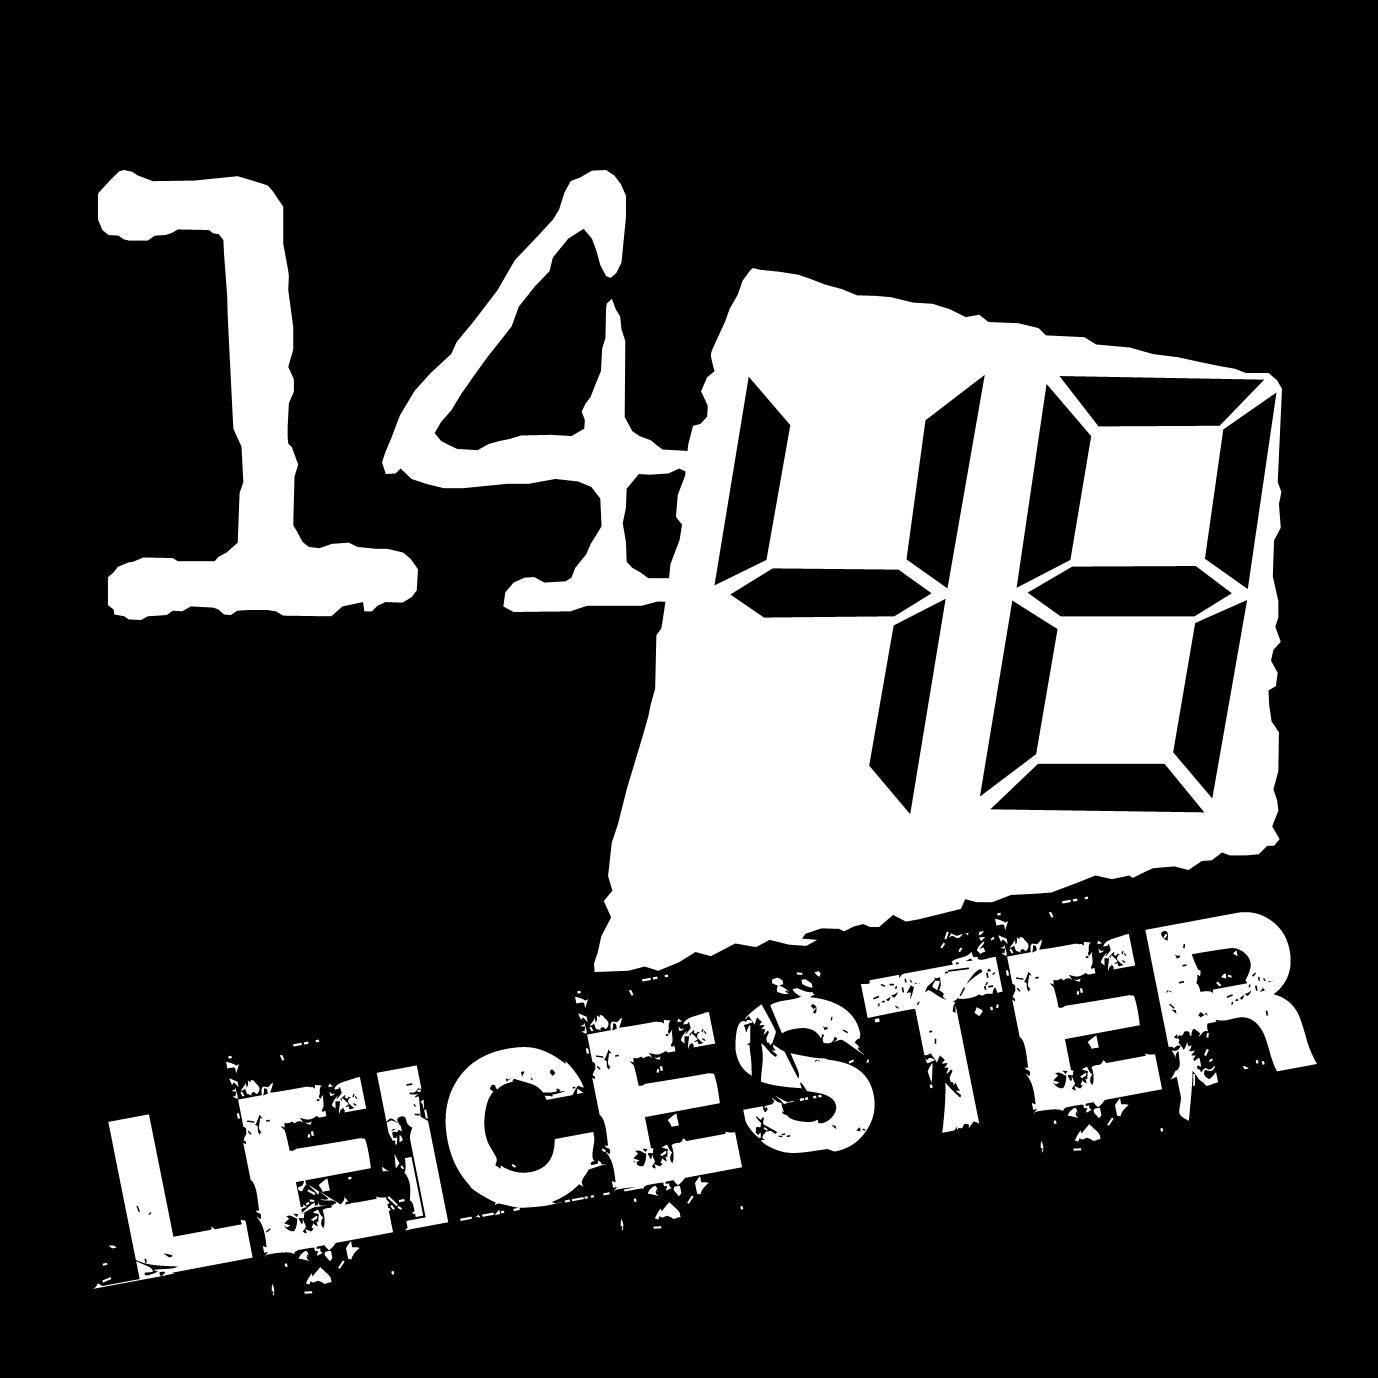 14/48 Festival Leicester